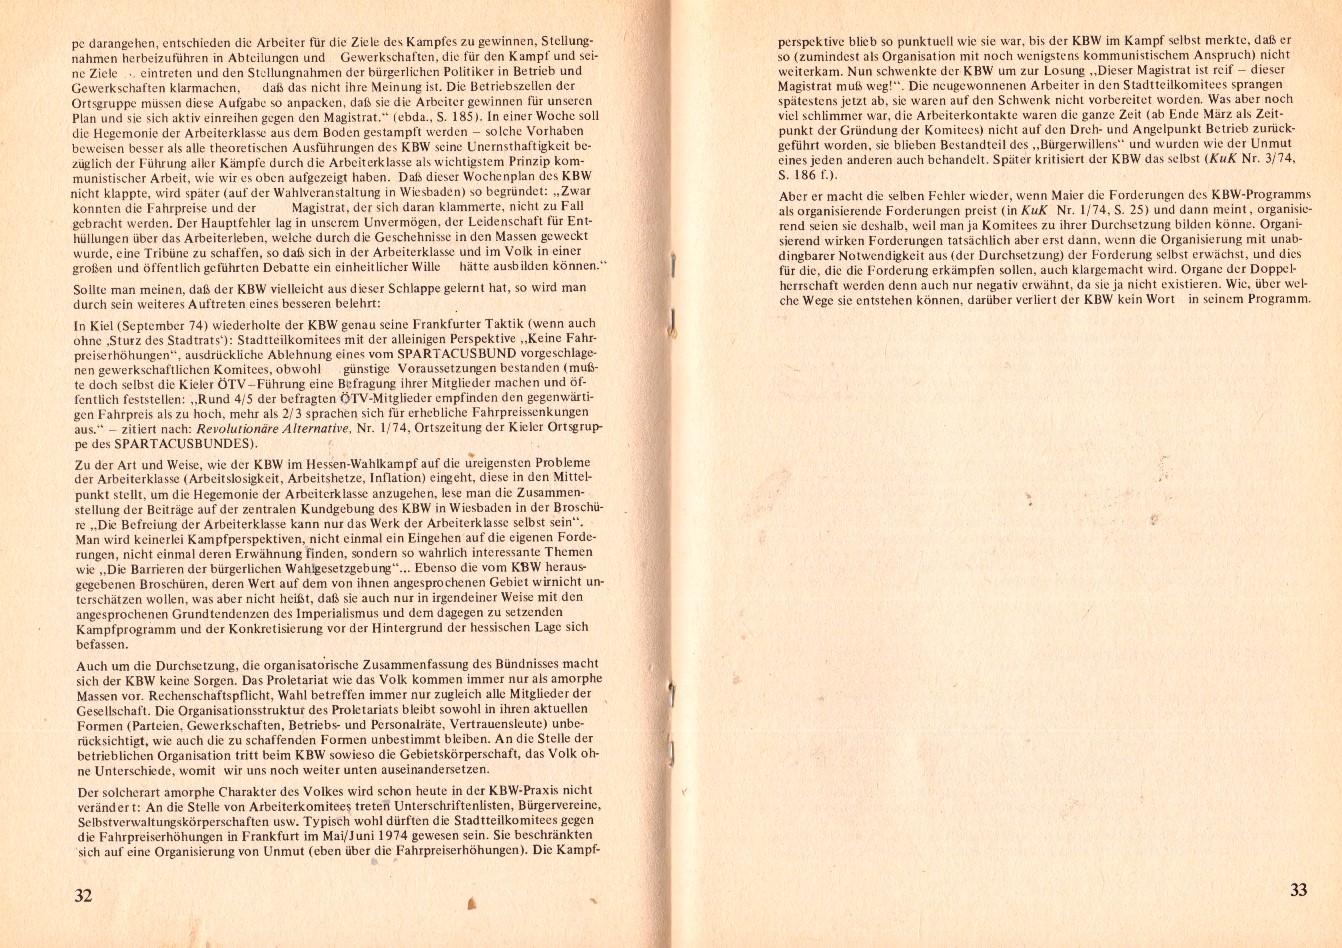 Spartacus_1975_Kritik_des_KBW_18